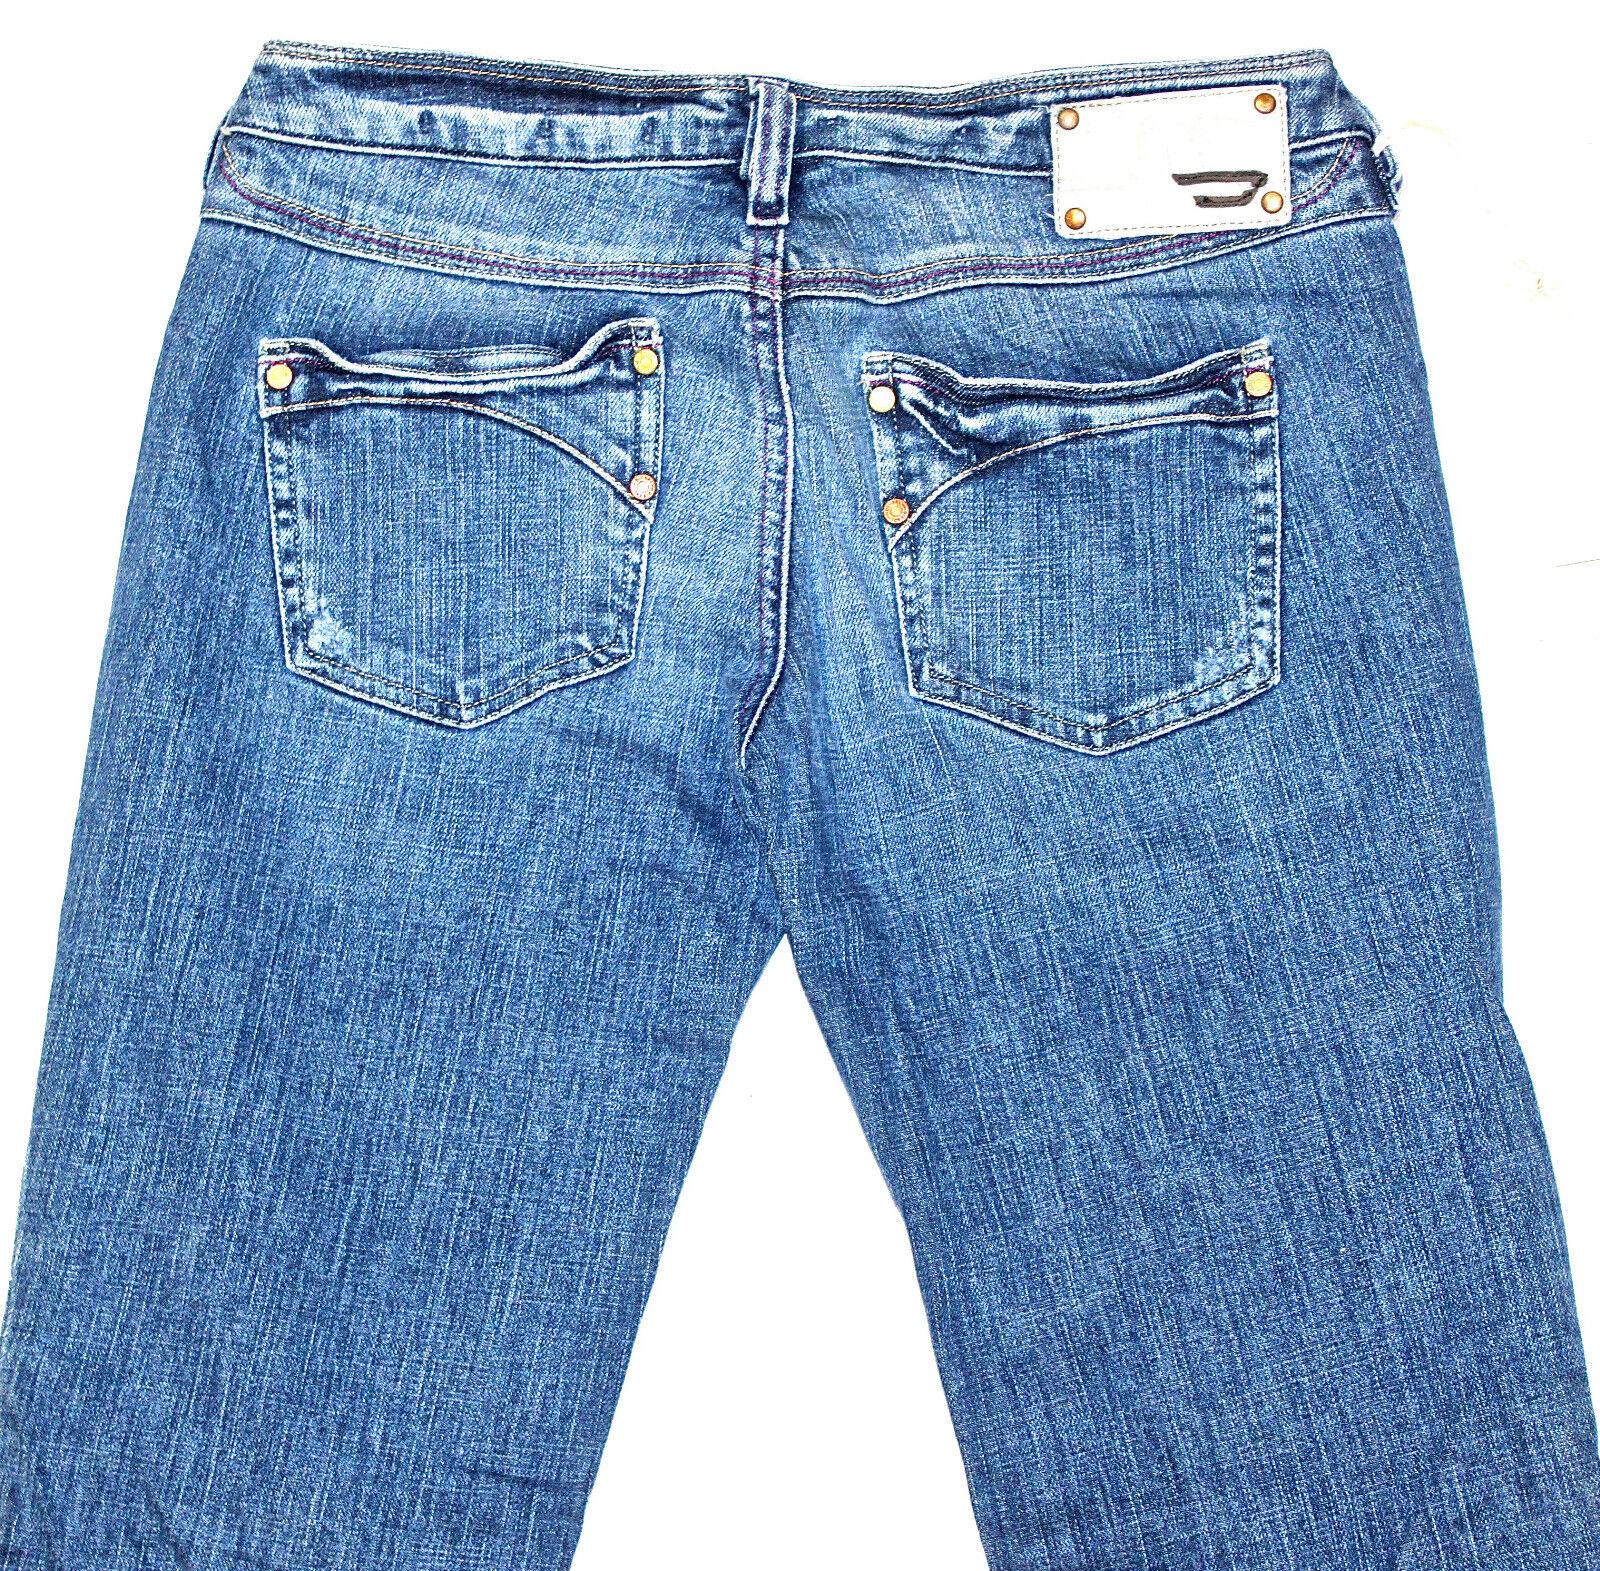 BNWT KYCUT 8BL Stretch DIESEL JEANS JEANS JEANS 27X32  AUTENTICA  Regular Fit Straight Leg 350f24